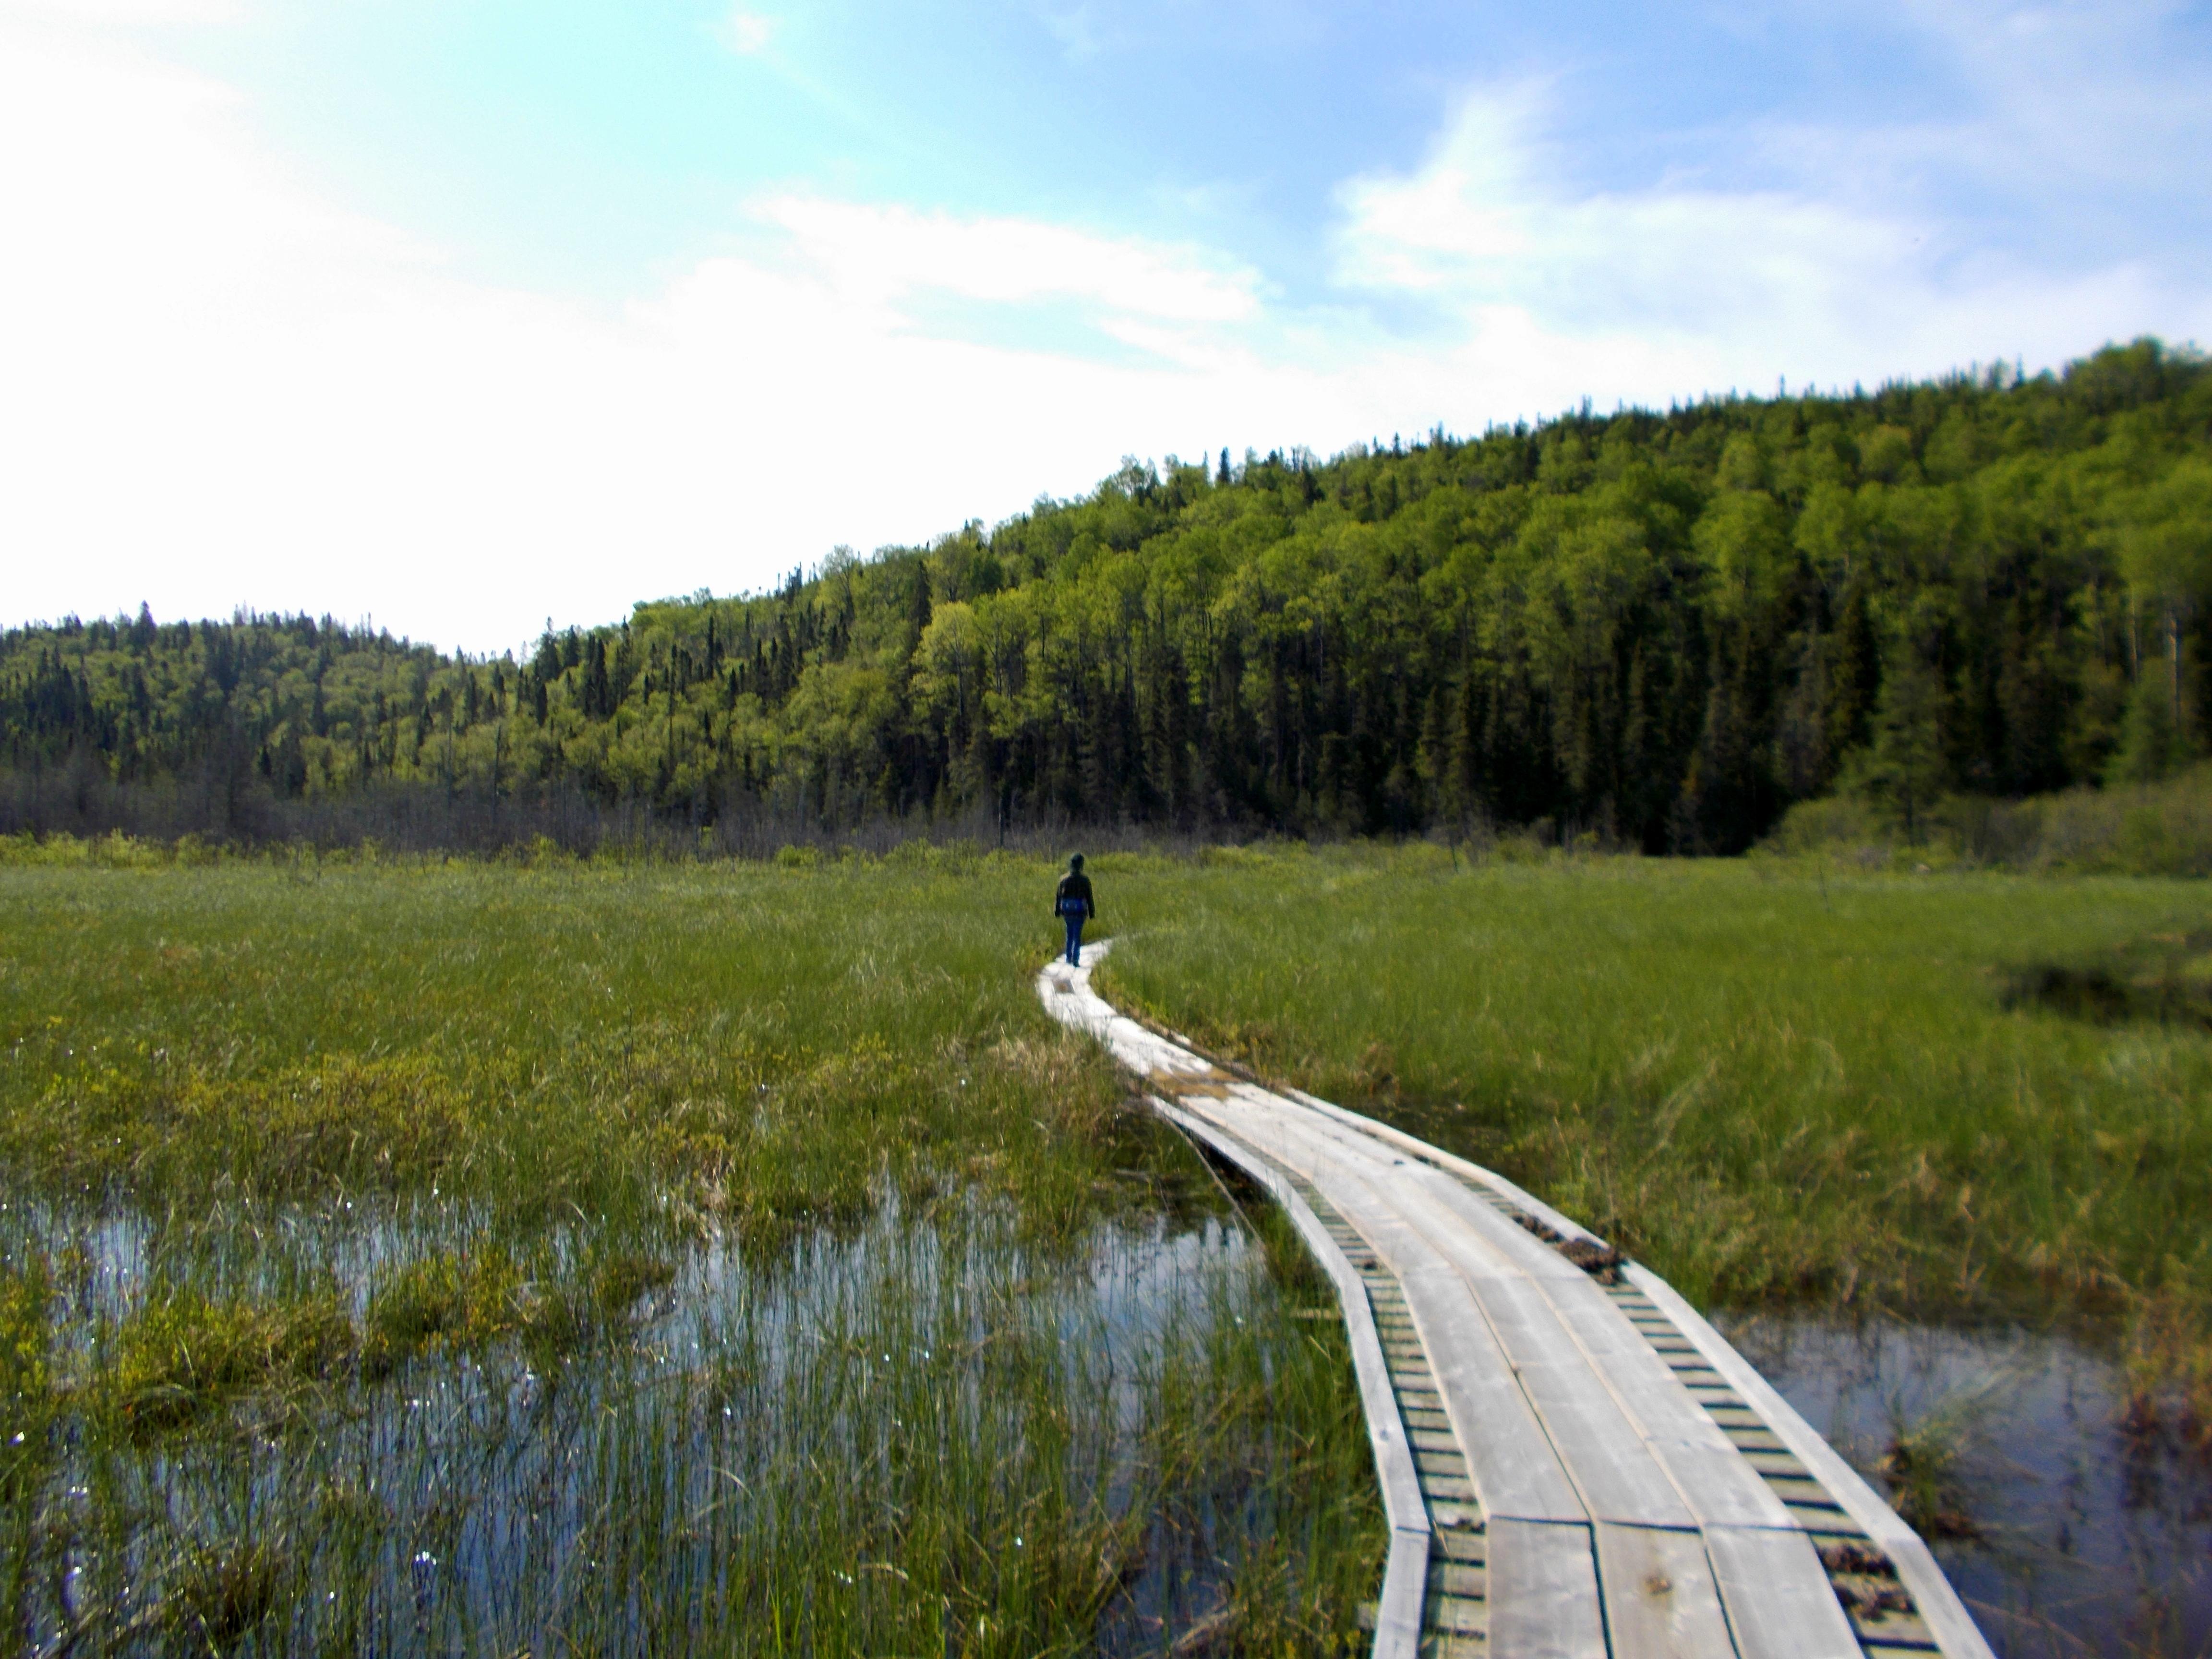 Worksheet. Pukaskwa National Park Part 3 Coastal Trail to White River